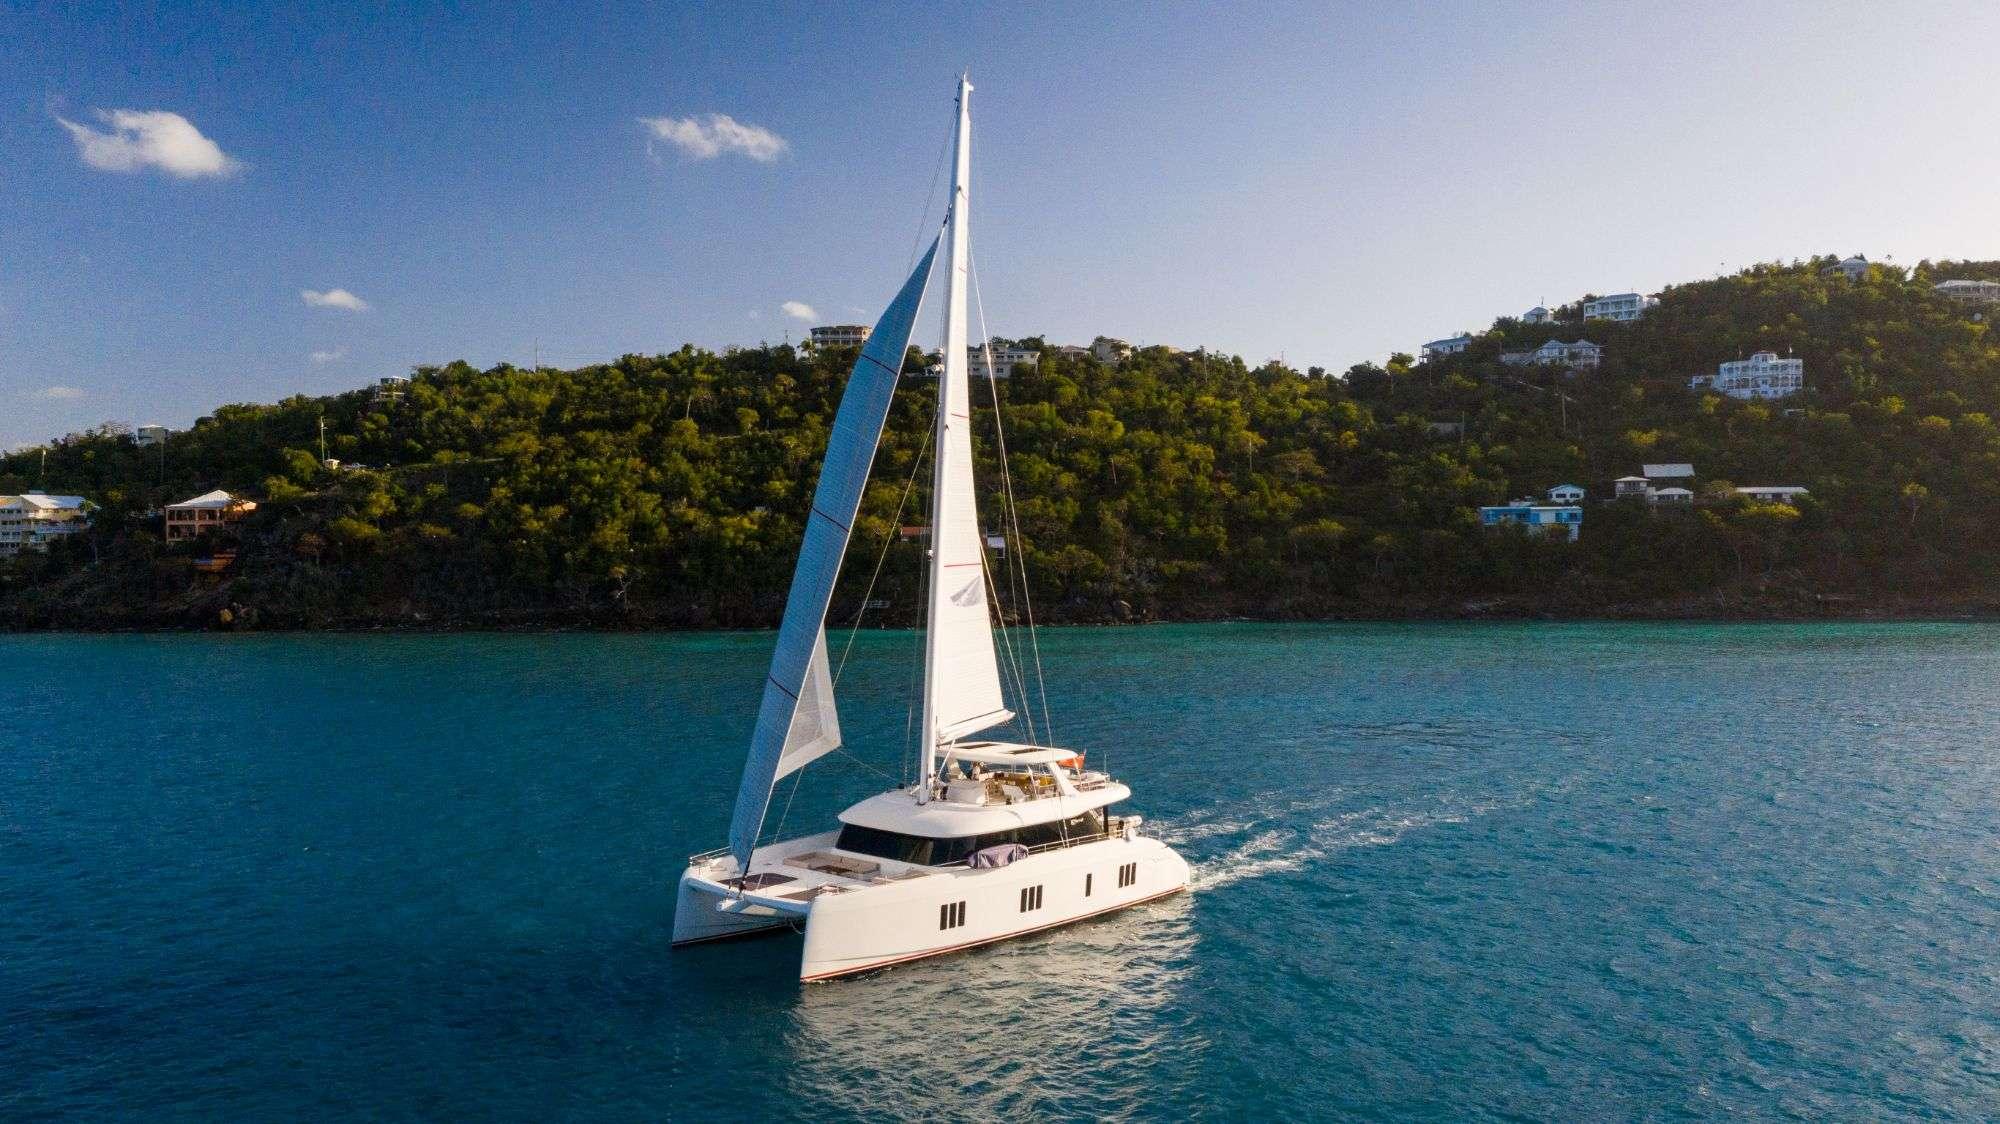 Main image of BUNDALONG yacht